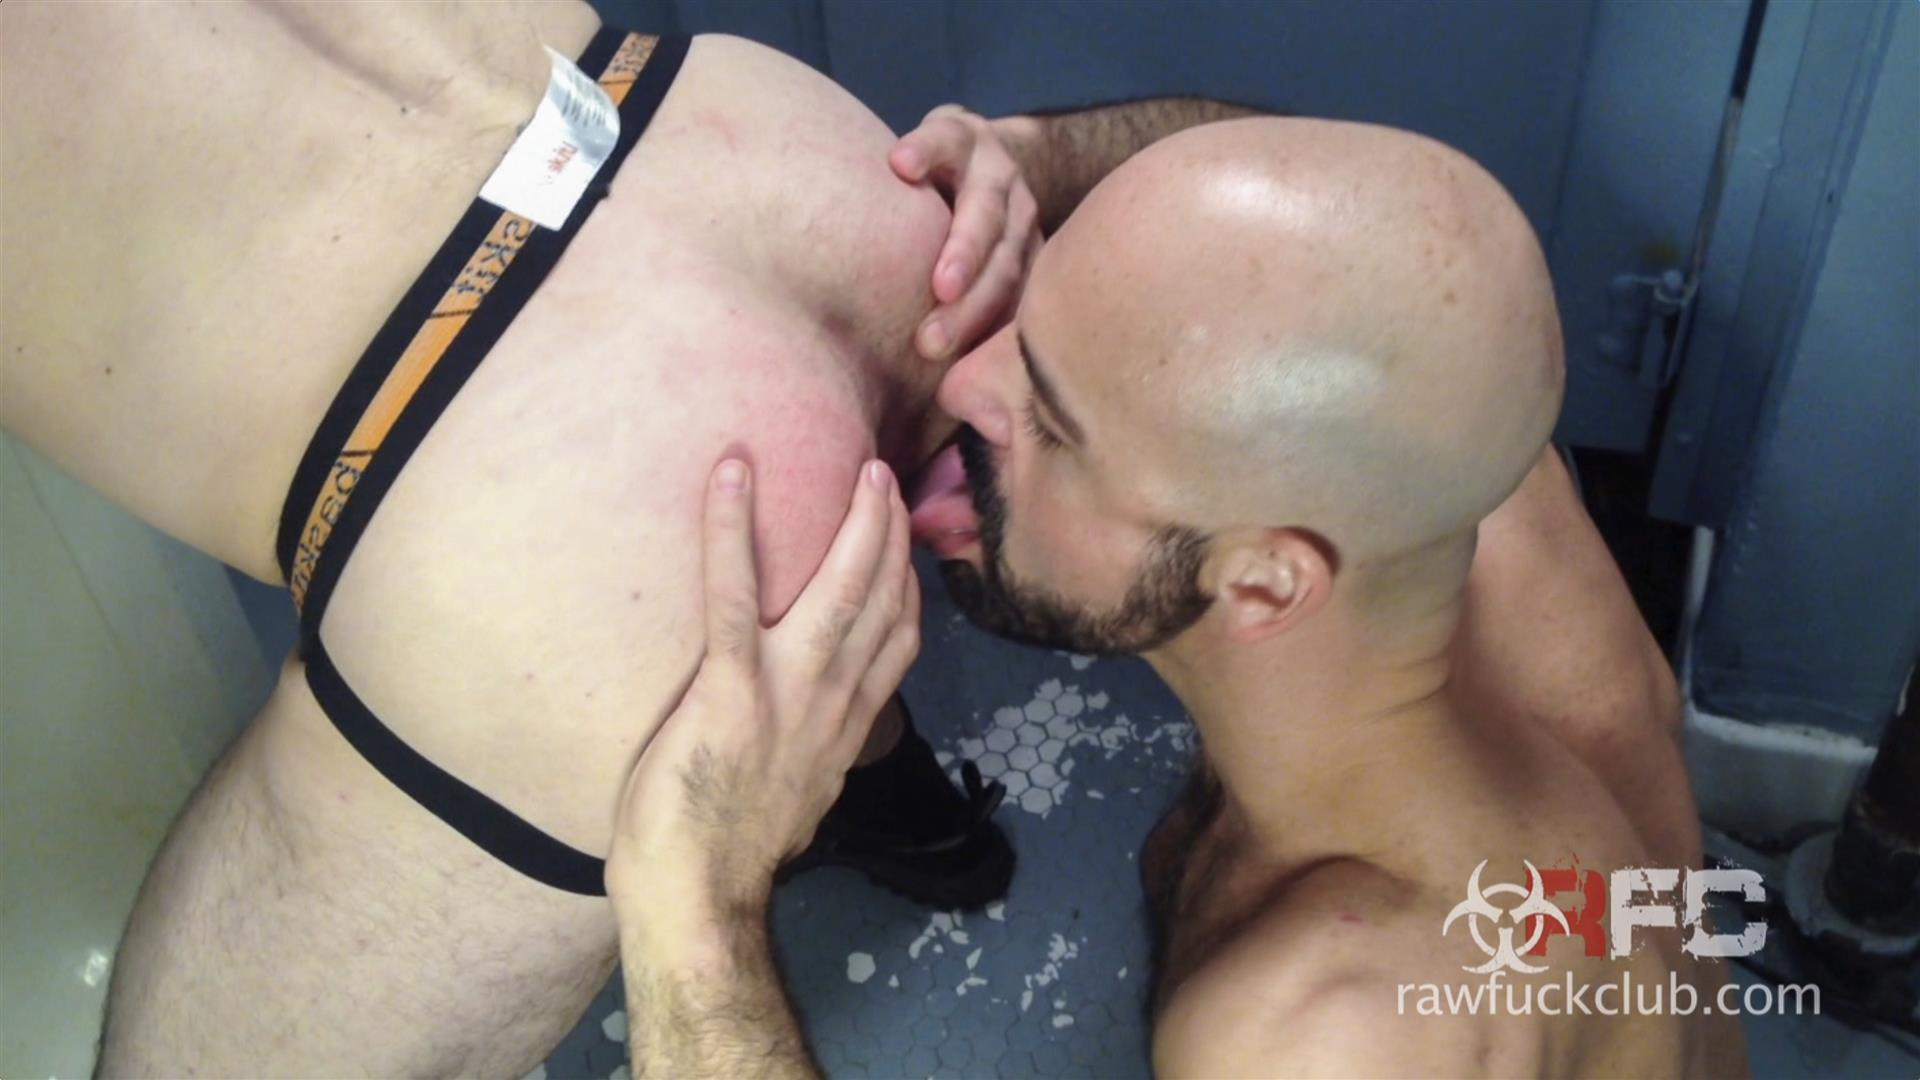 Raw Fuck Club Adam Russo and Kyle Ferris Anonymous Bareback Sex Amateur Gay Porn 4 Adam Russo Barebacking A Stranger In A Dirty Bar Bathroom